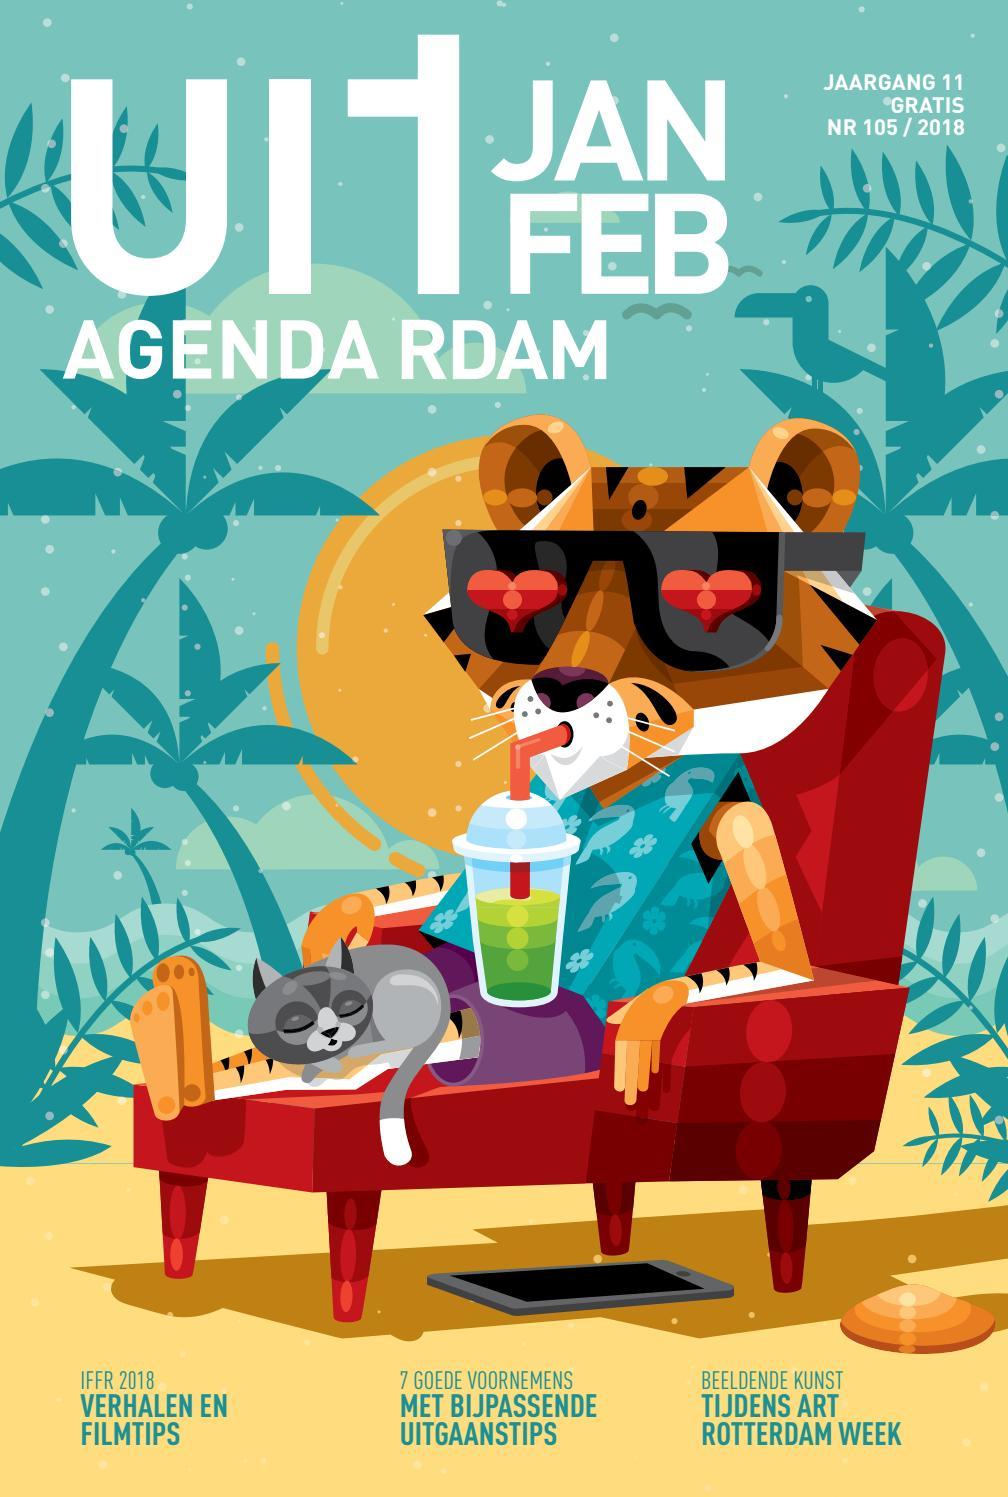 Uitagenda januari februari 2018 by rotterdam festivals issuu for Uit agenda rotterdam